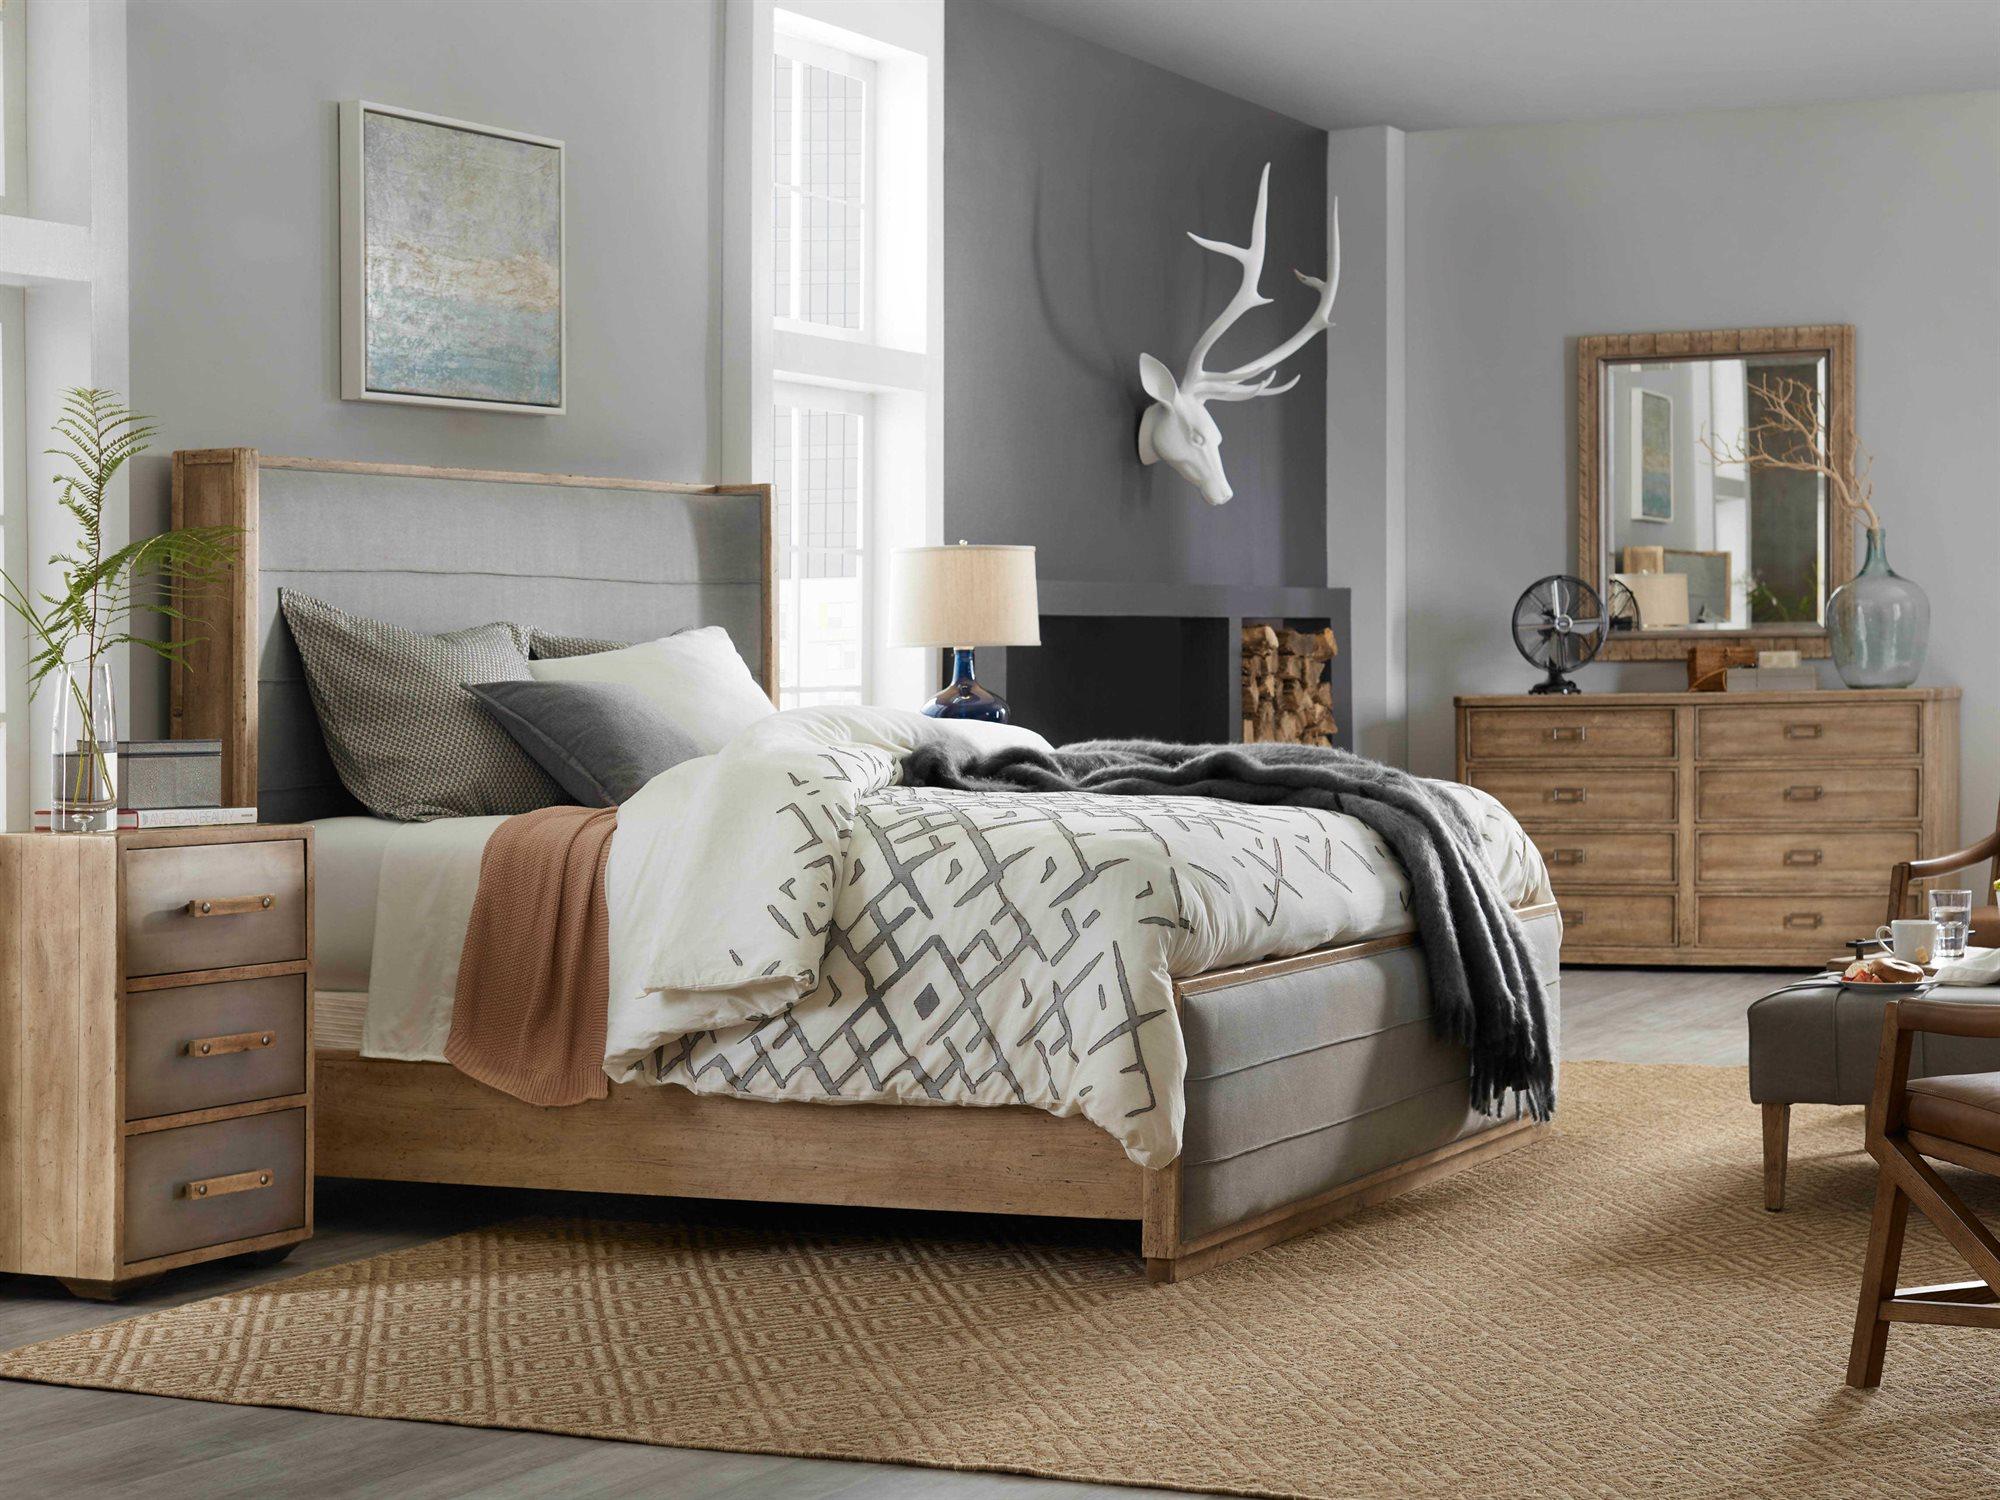 Hooker Furniture American Life - Urban Elevation Bedroom Set